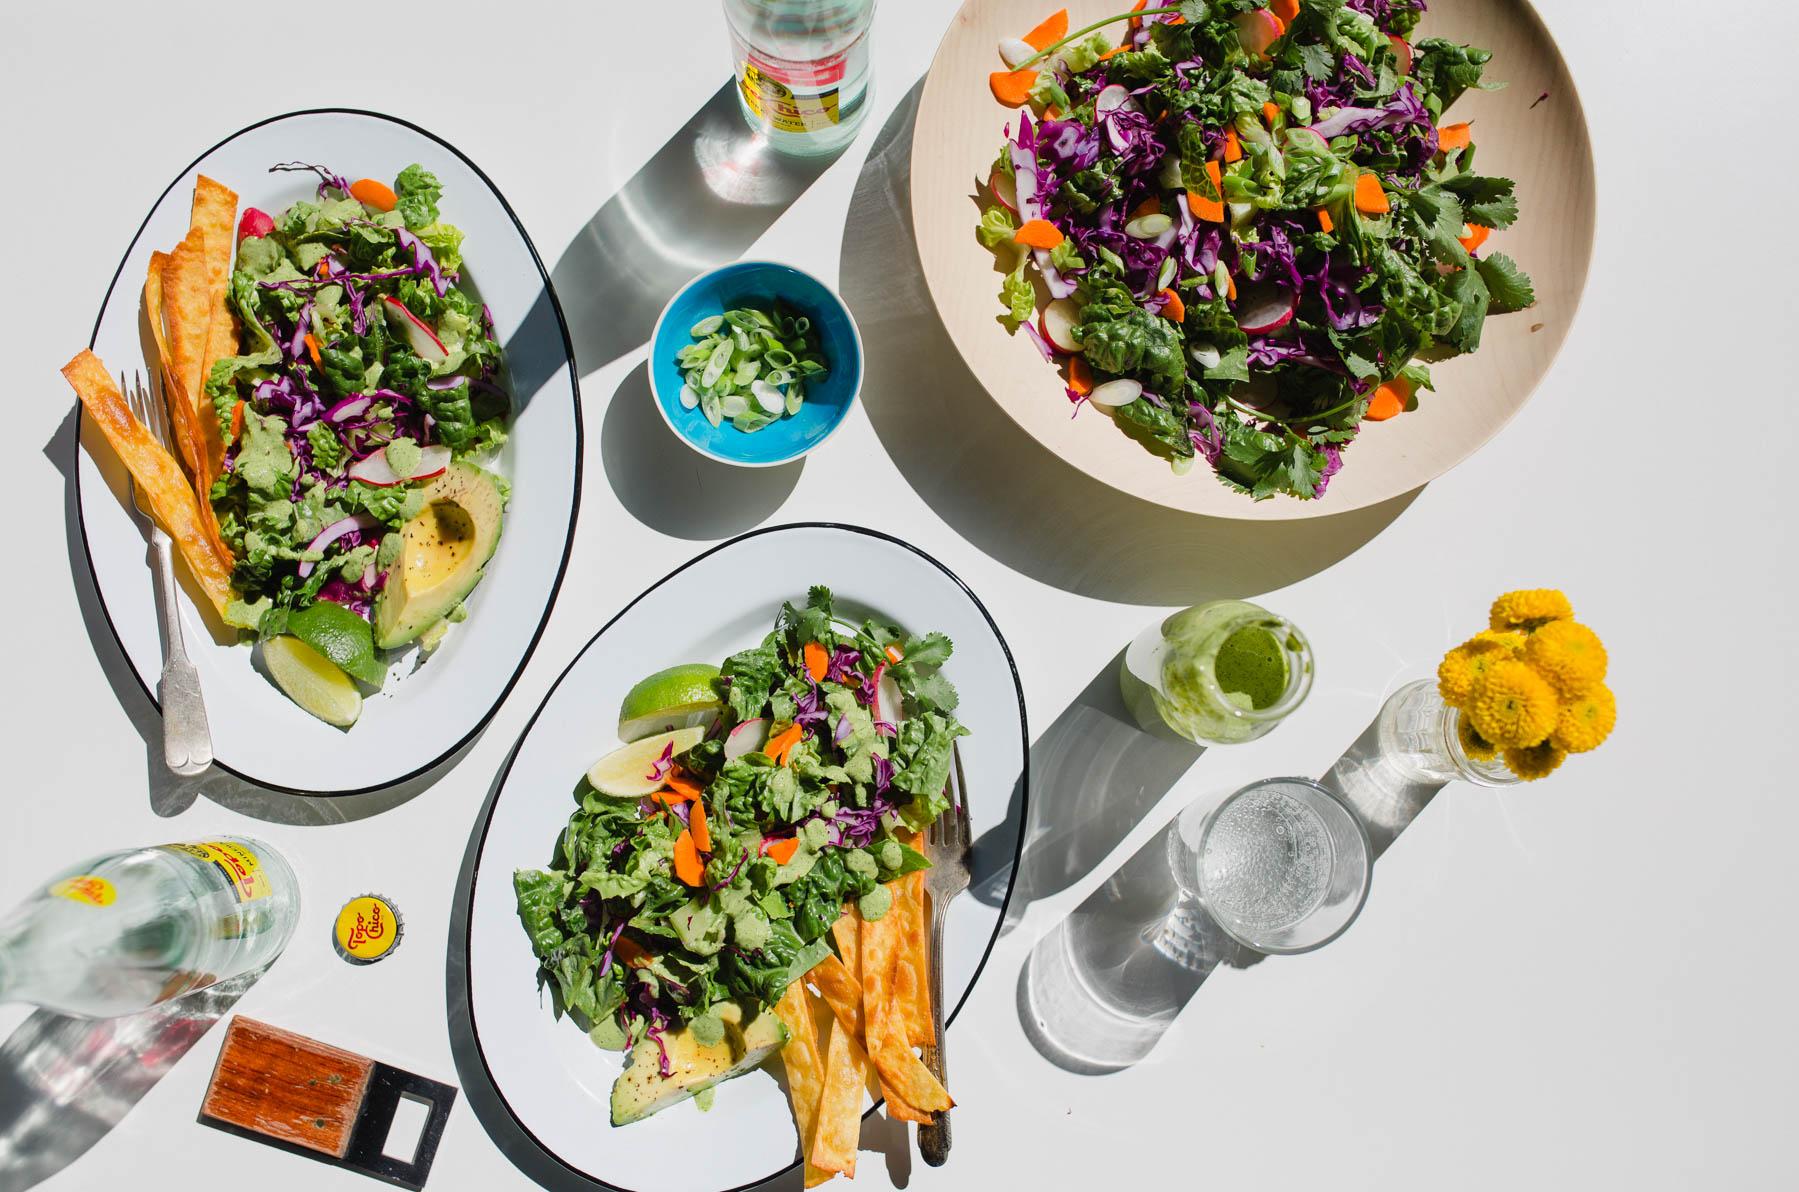 chicago-nyc-food-lifestyle-photographer-44.jpg